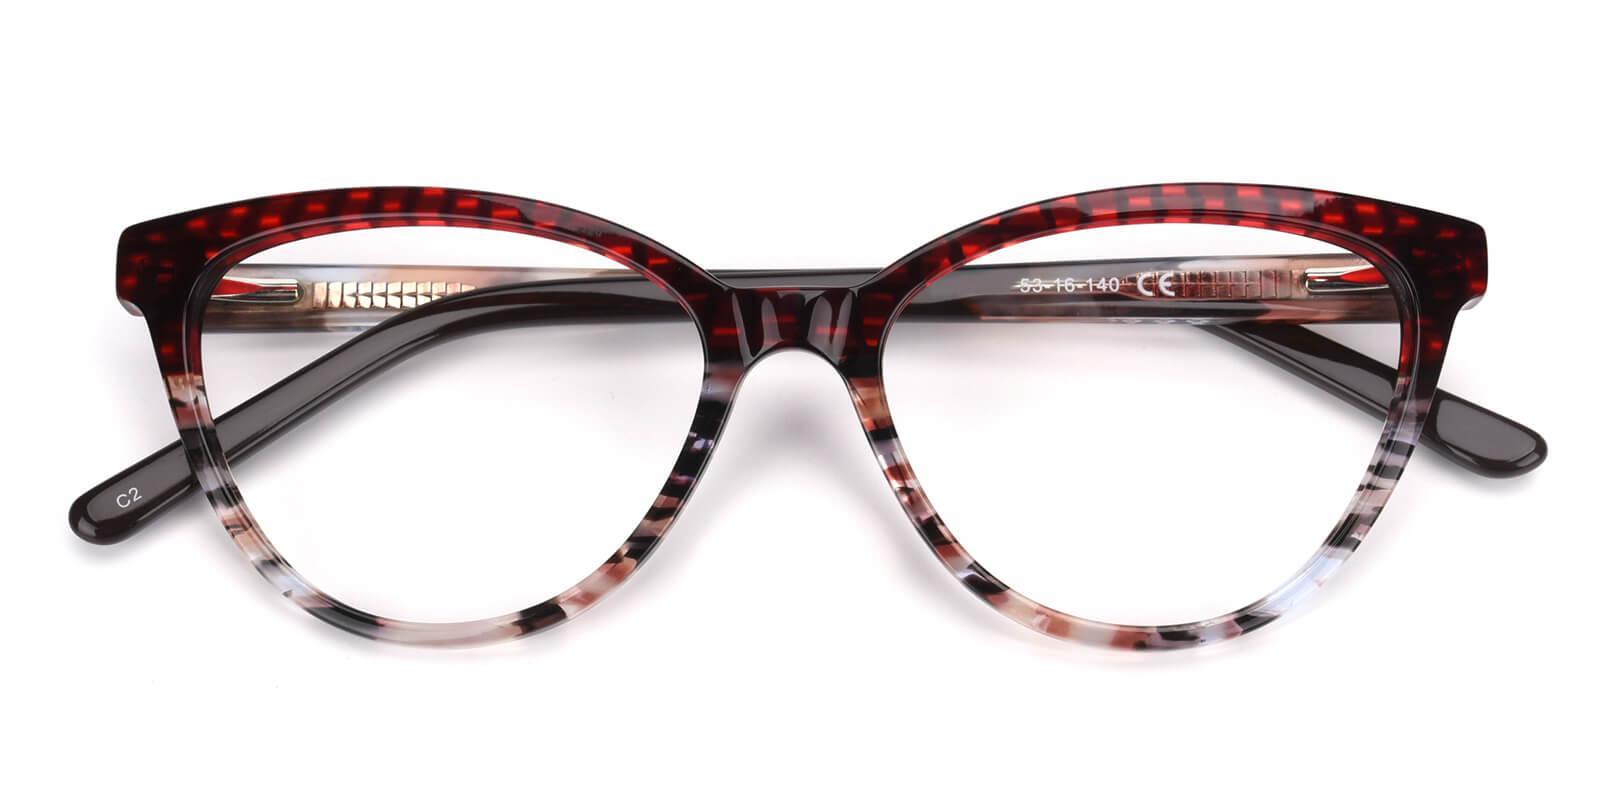 Daphnely-Red-Cat-Acetate-Eyeglasses-detail